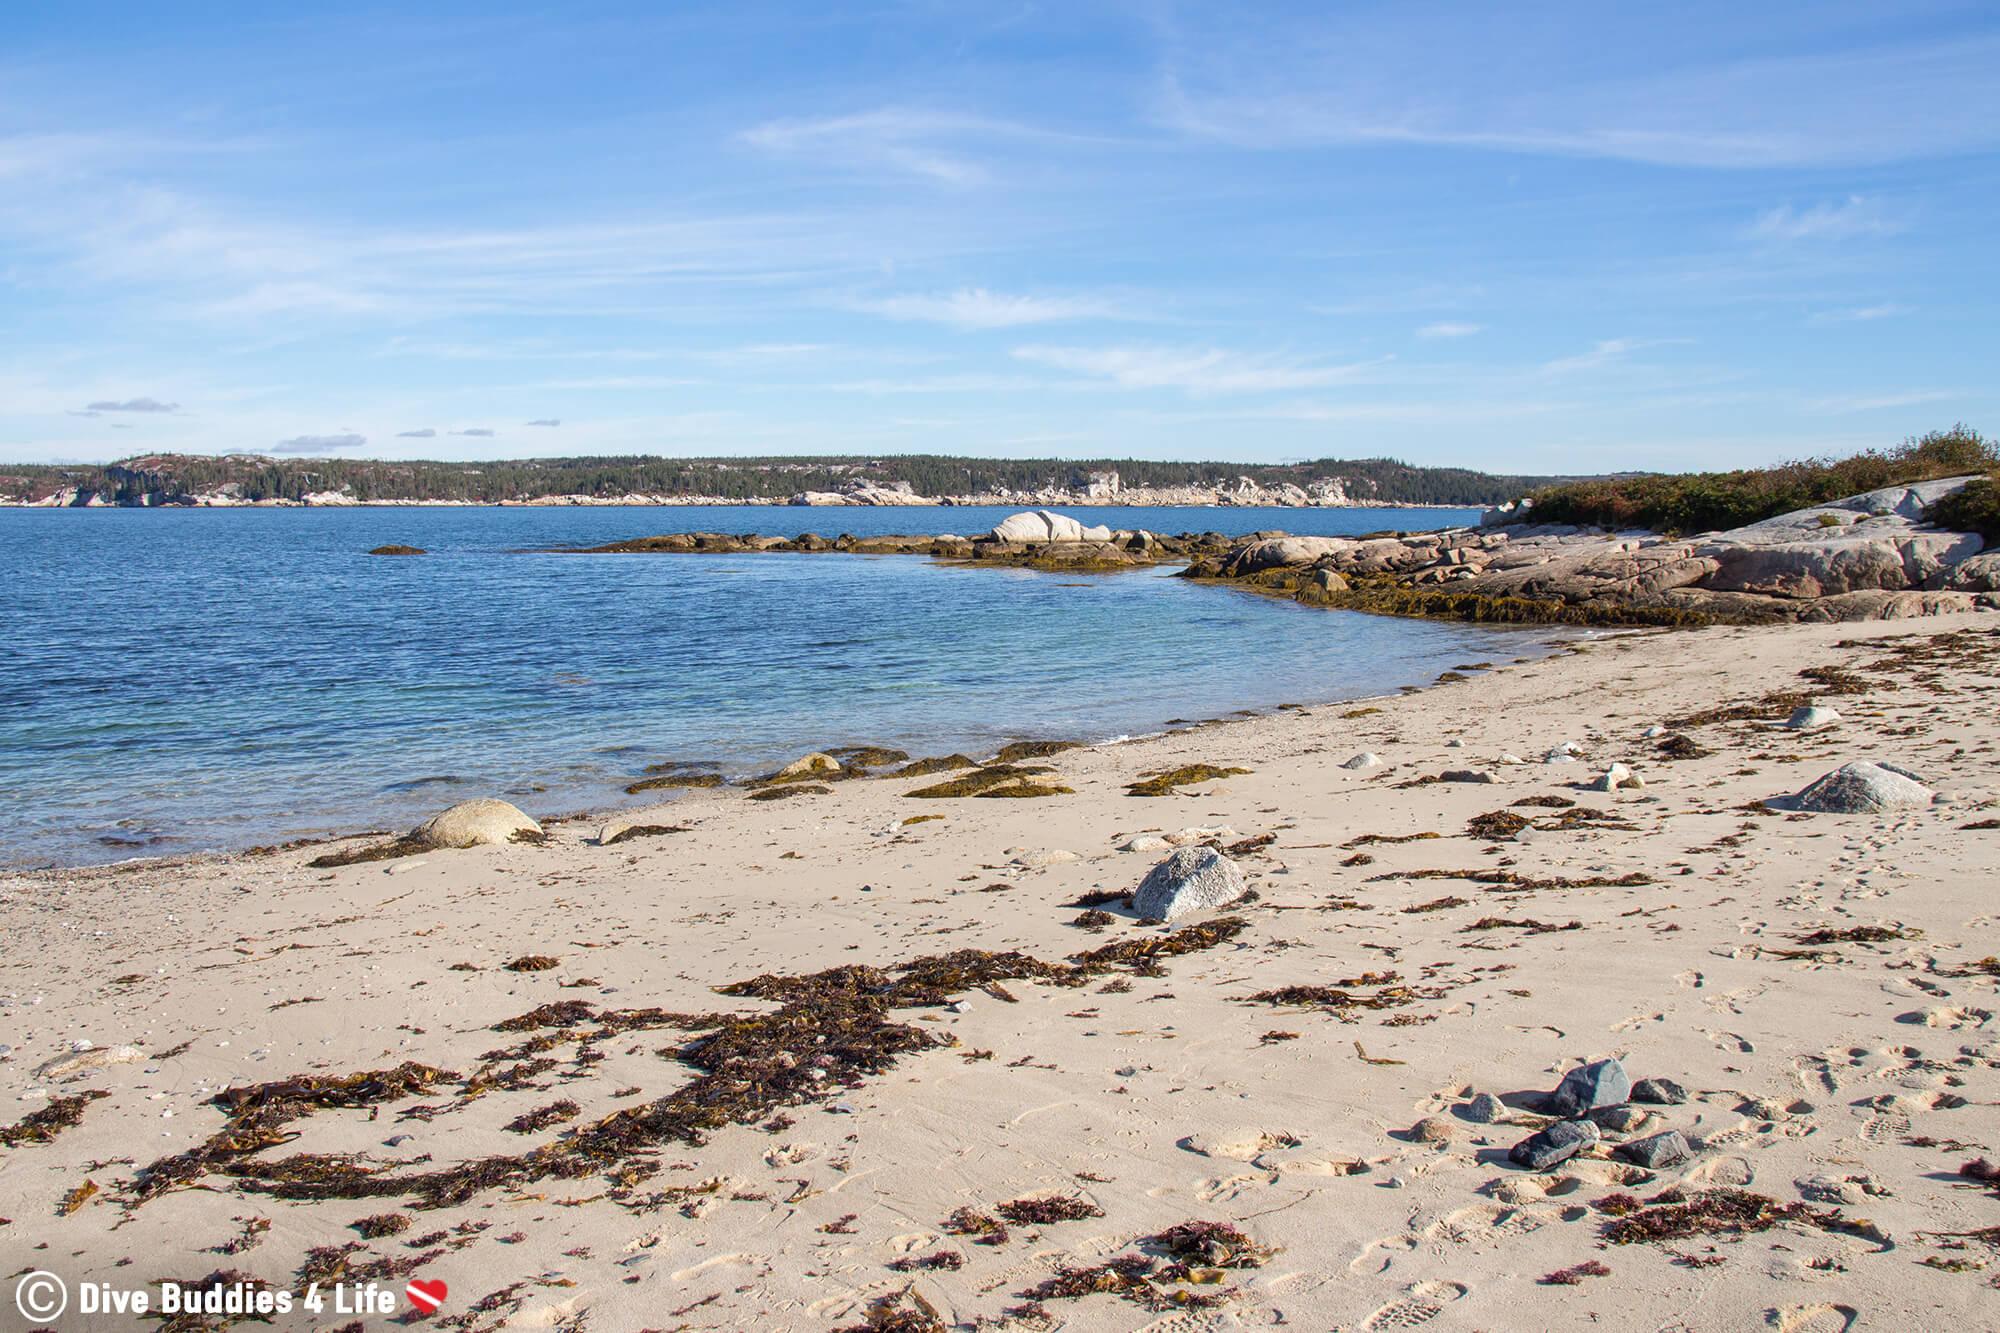 The Atlantic Ocean At Sandy Cove Beach In Halifax, Nova Scotia, Canada